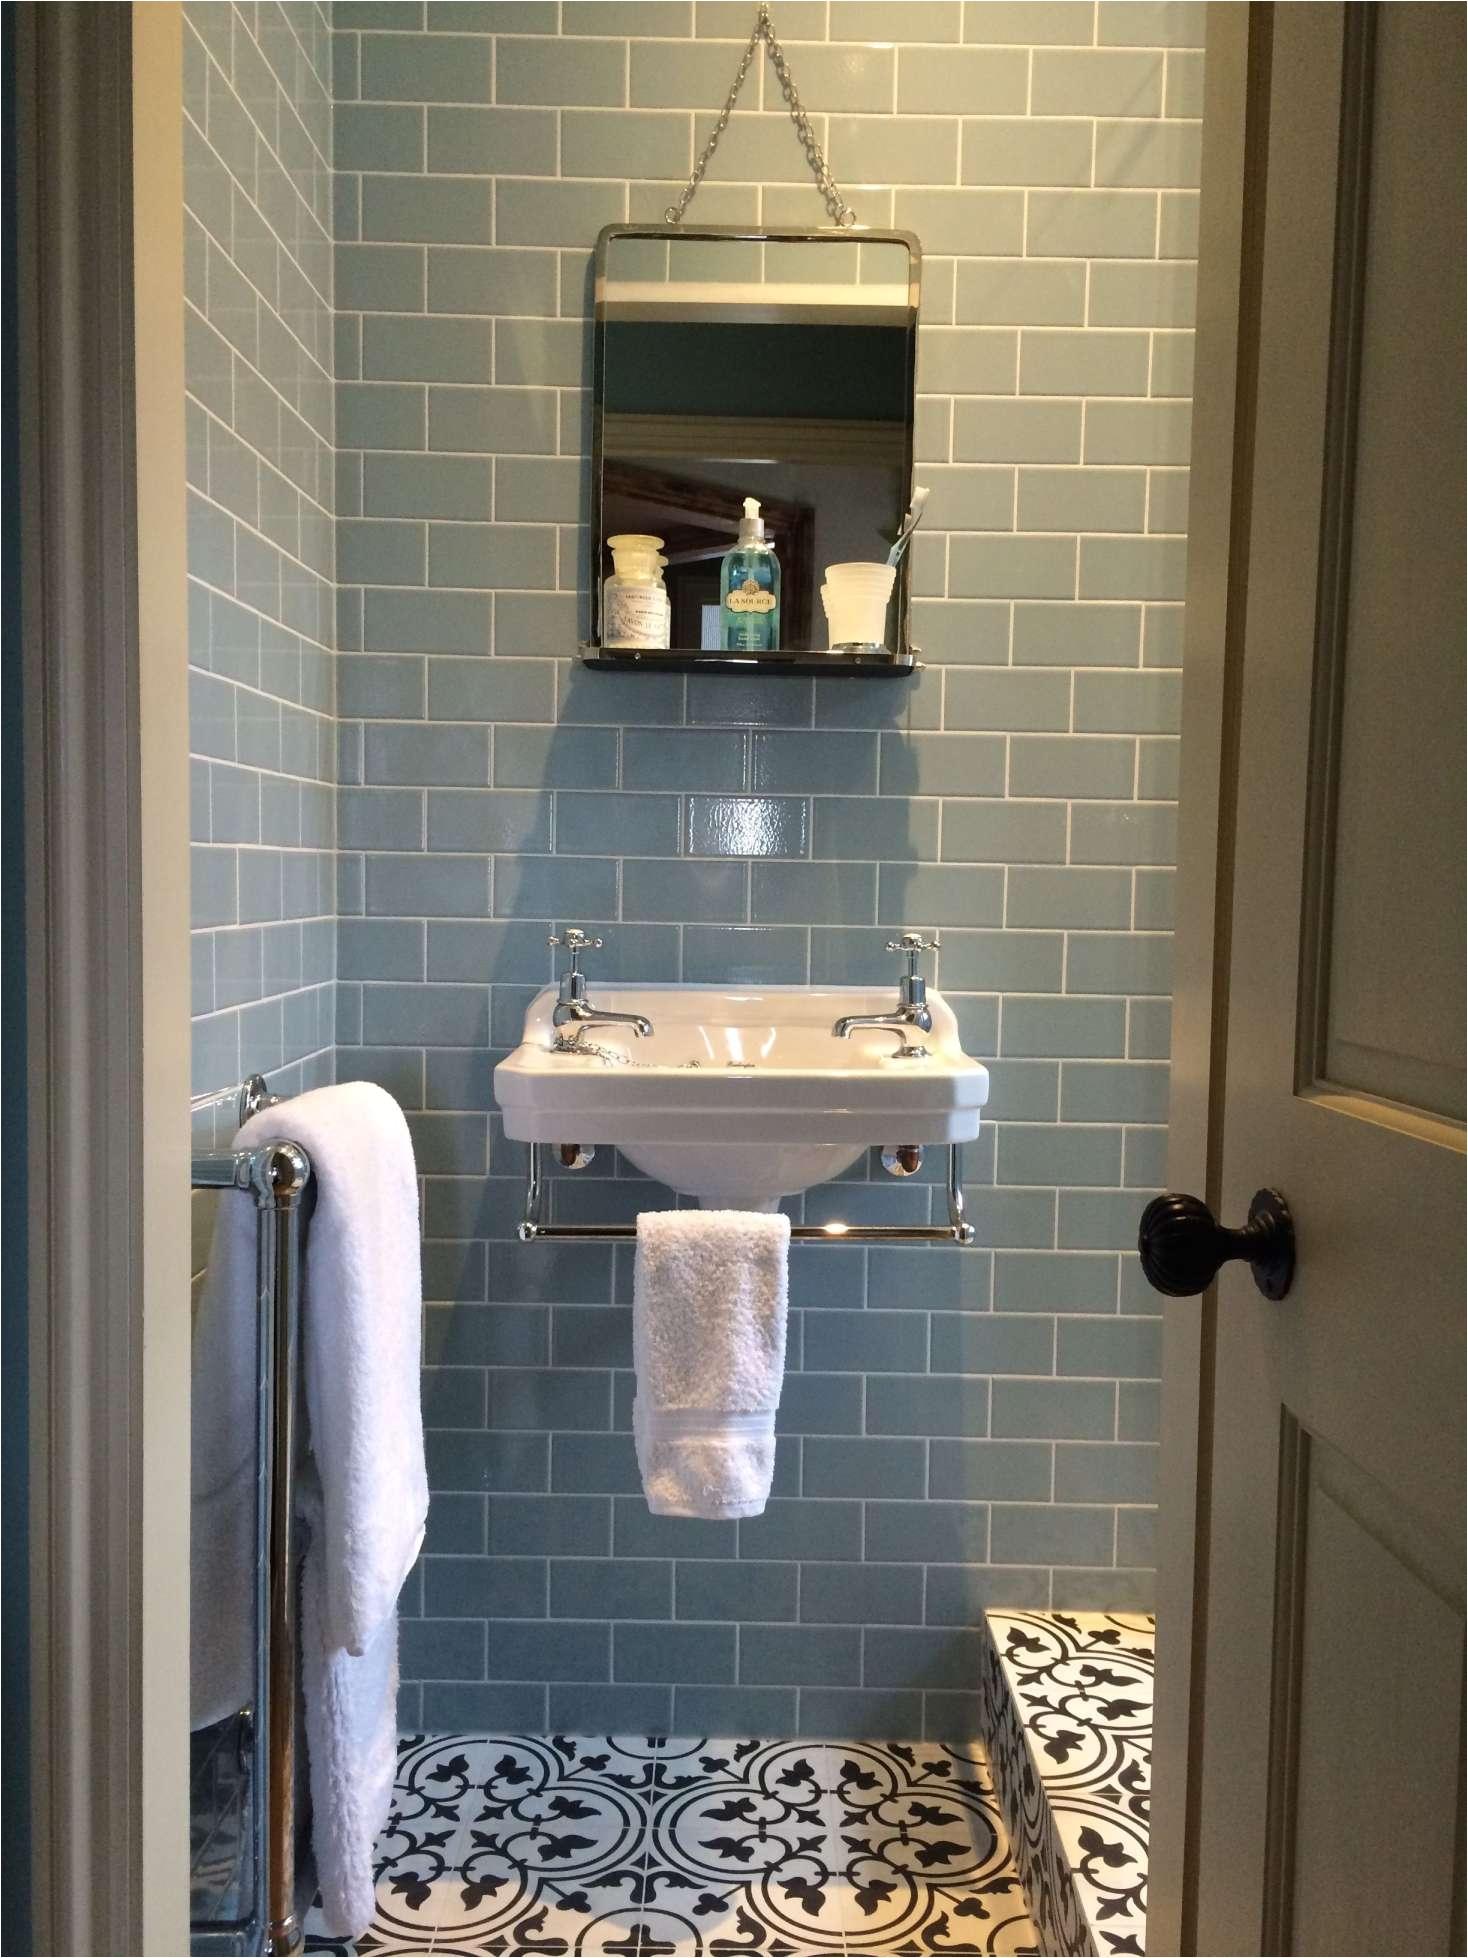 Adorable Subway Tile Bathroom Ideas At Bathroom Tiled Walls Design Ideas